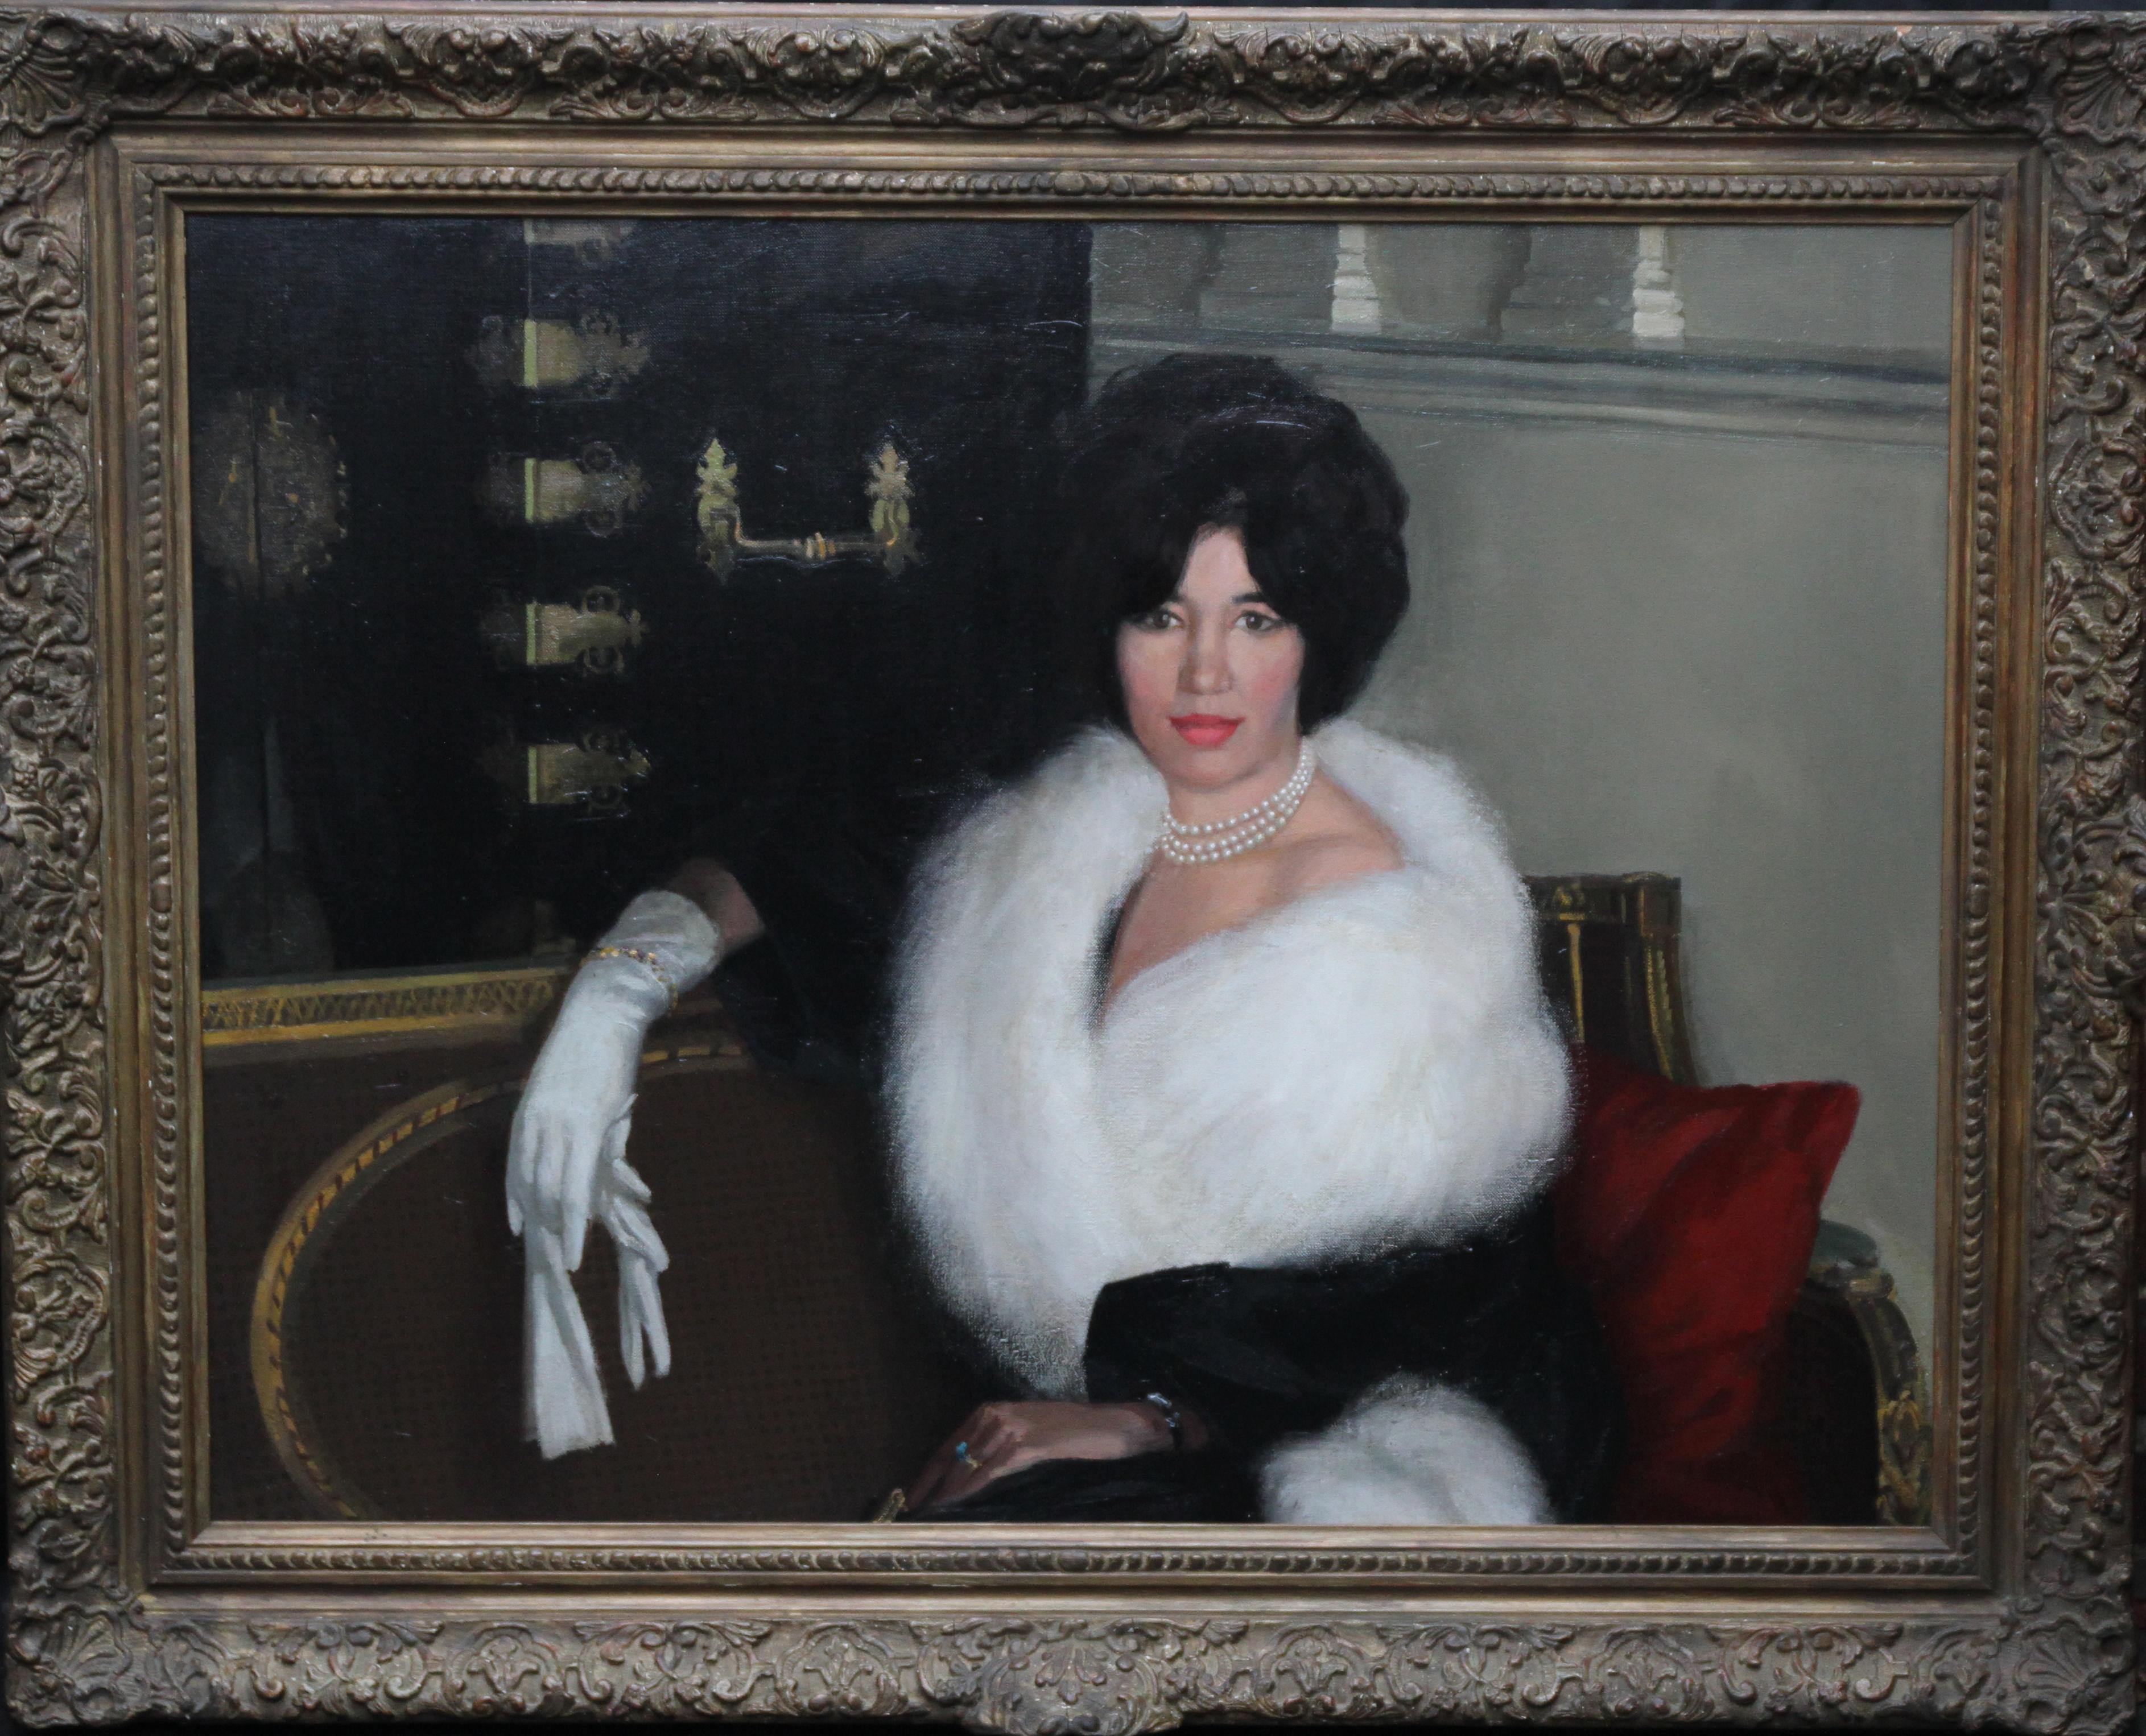 Mrs Rona Lucas Nee Levey - Britsh art 50s oil painting interior female portrait